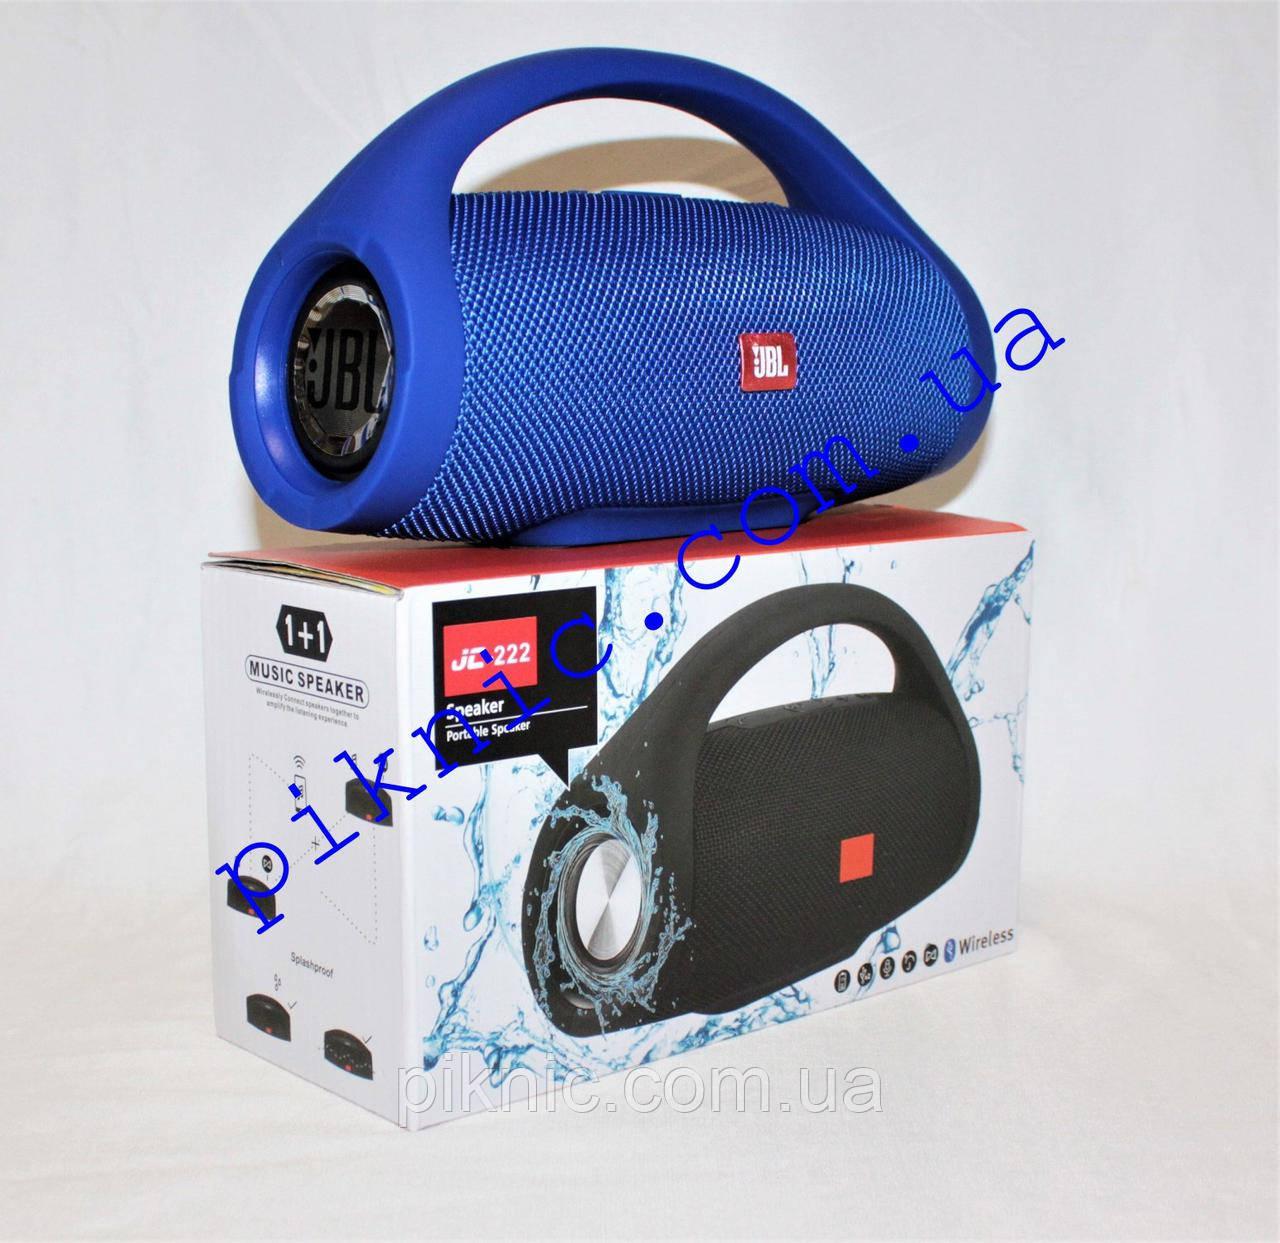 Беспроводная колонка JBL Boombox. Портативная Bluetooth колонка. Синий